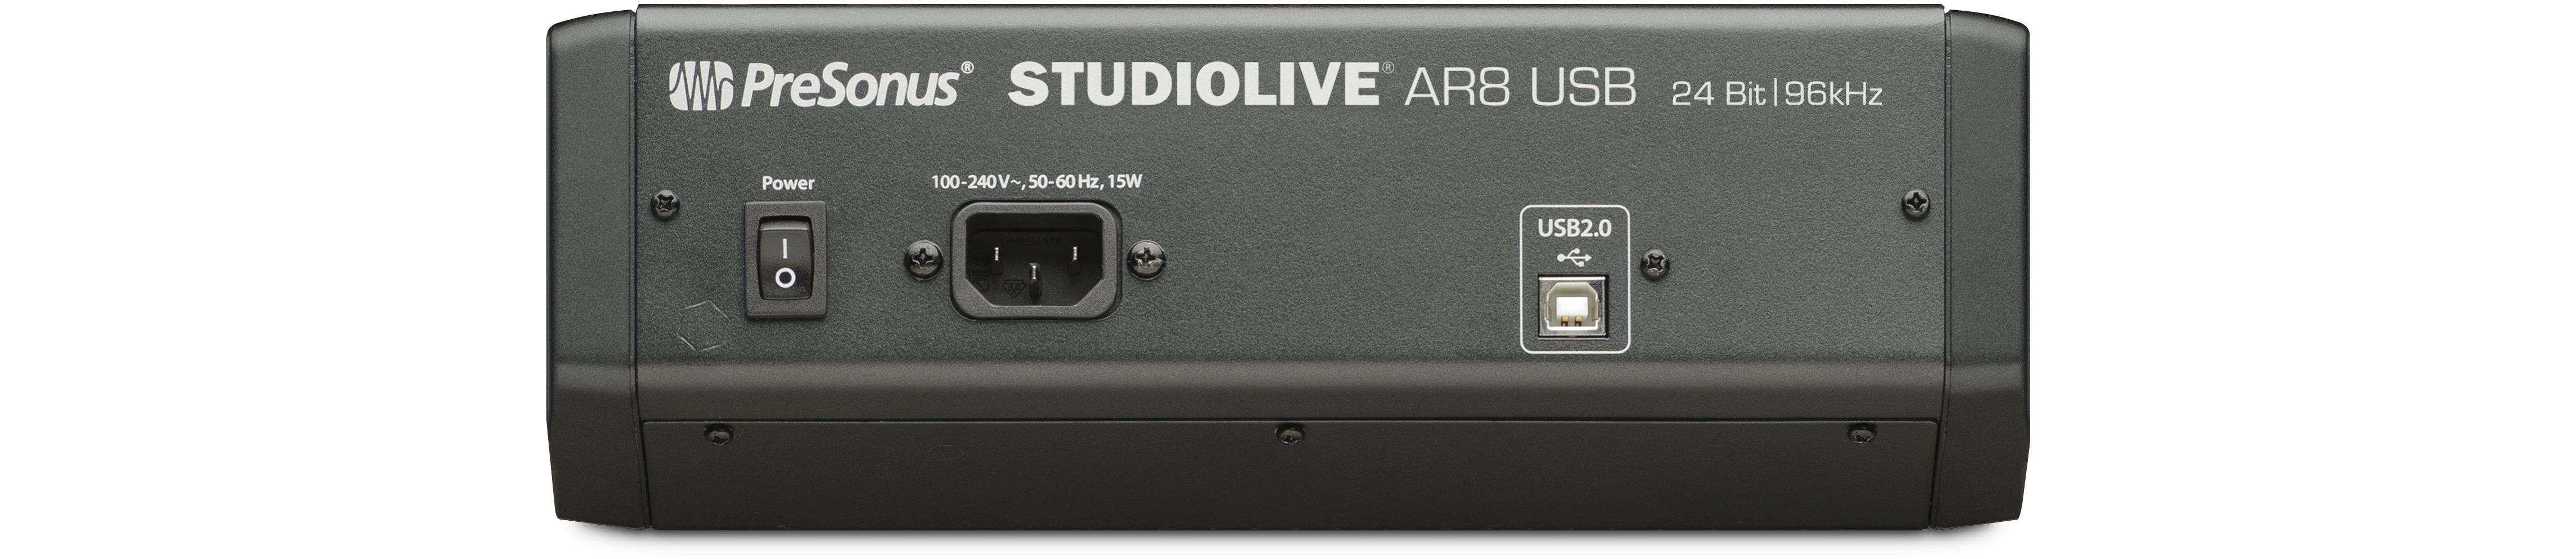 StudioLive AR8 USB | Images and Videos | PreSonus